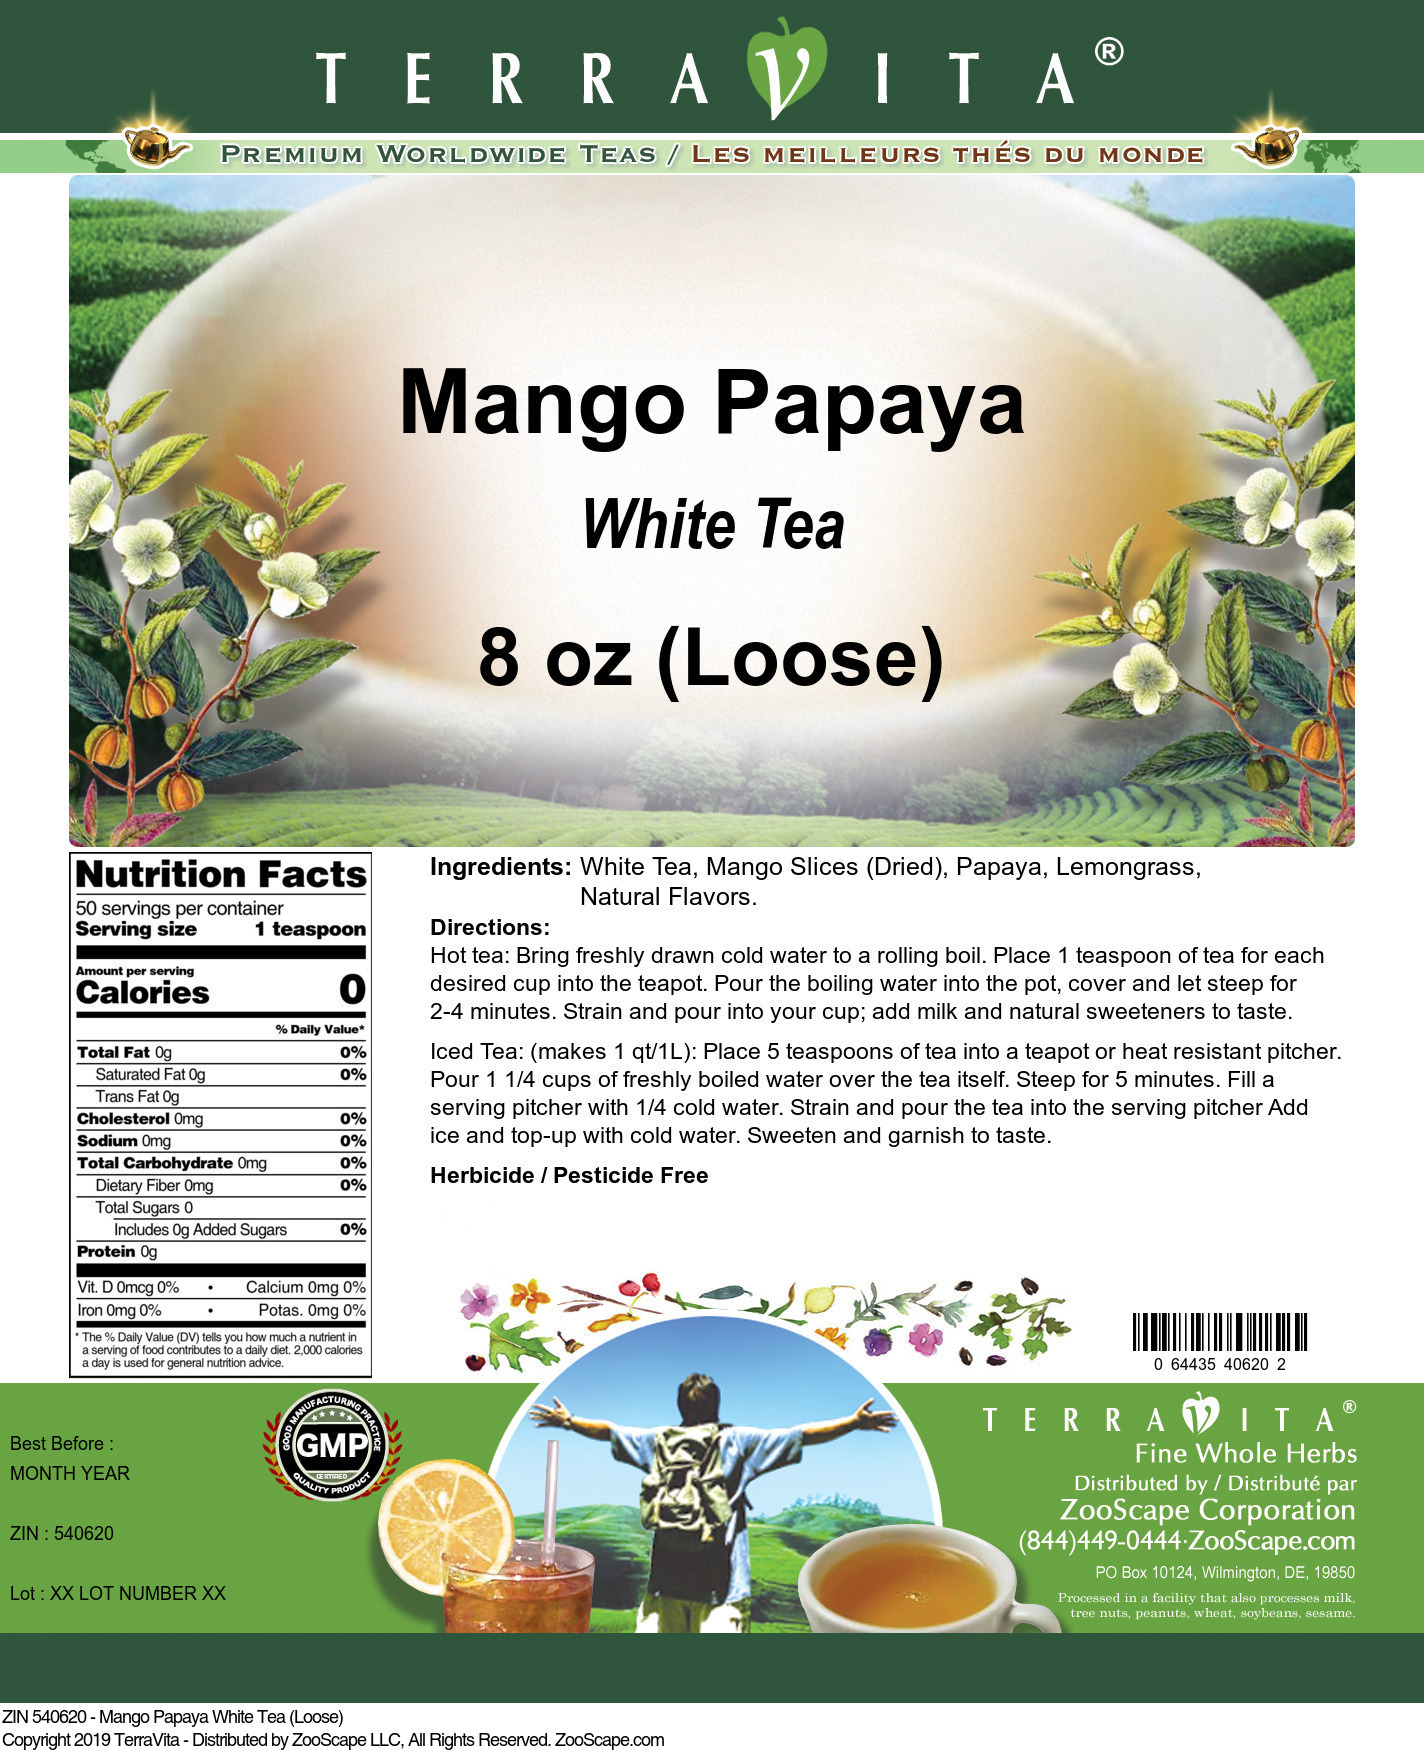 Mango Papaya White Tea